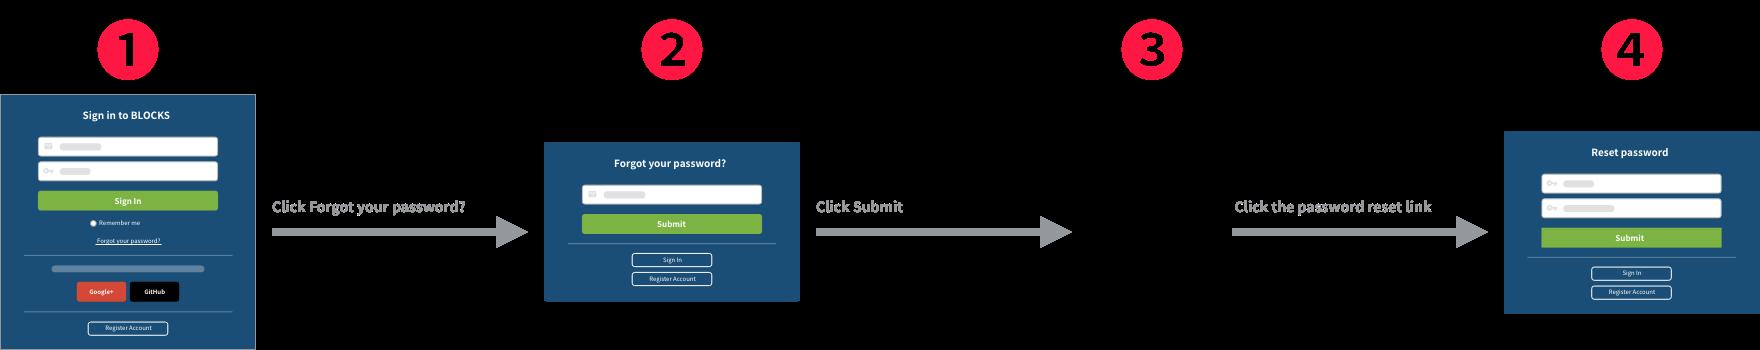 Password reset process